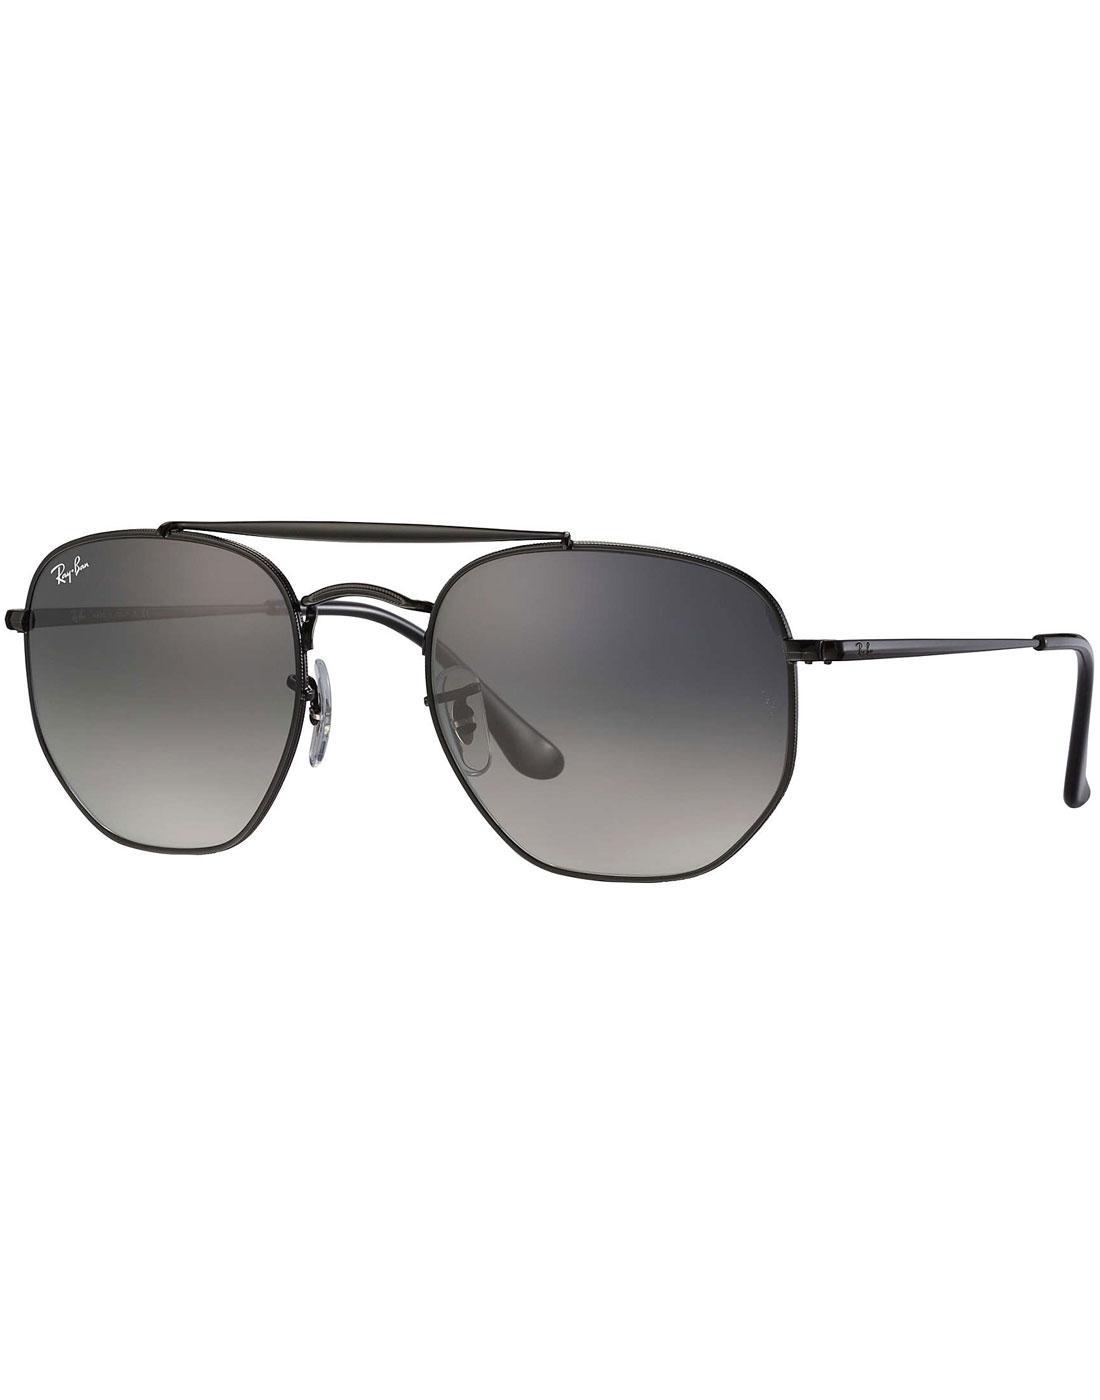 Marshal RAY-BAN Retro 70s Aviator Sunglasses BLACK